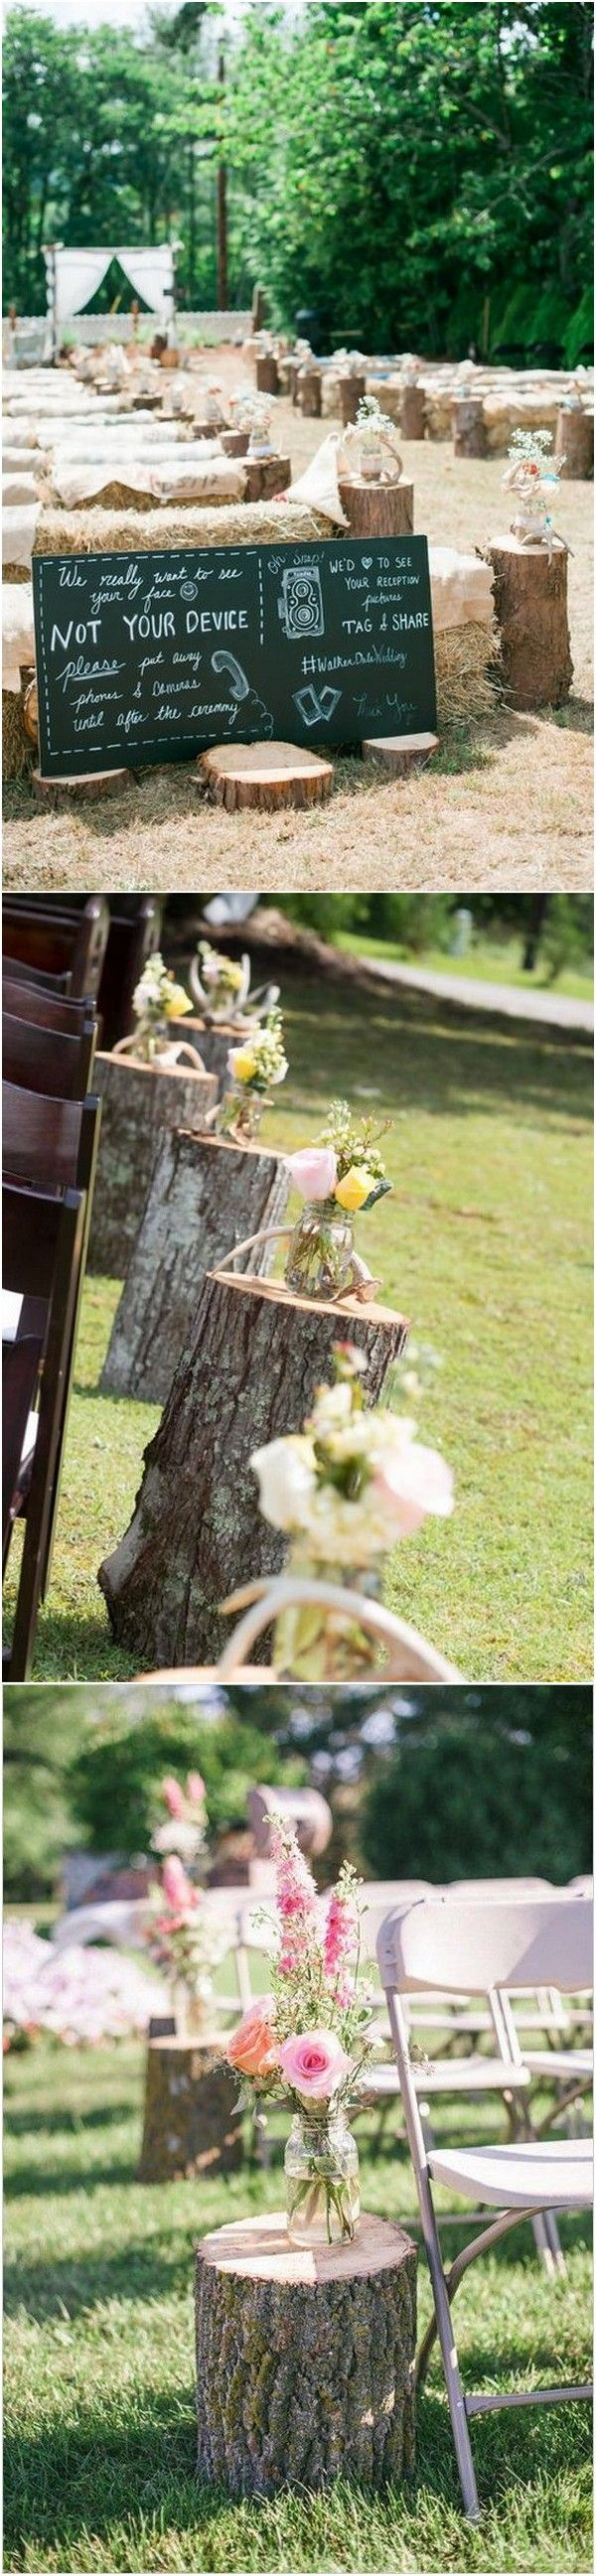 Wedding aisle decor ideas diy   Country Rustic Wedding Decoration Ideas with Tree Stumps